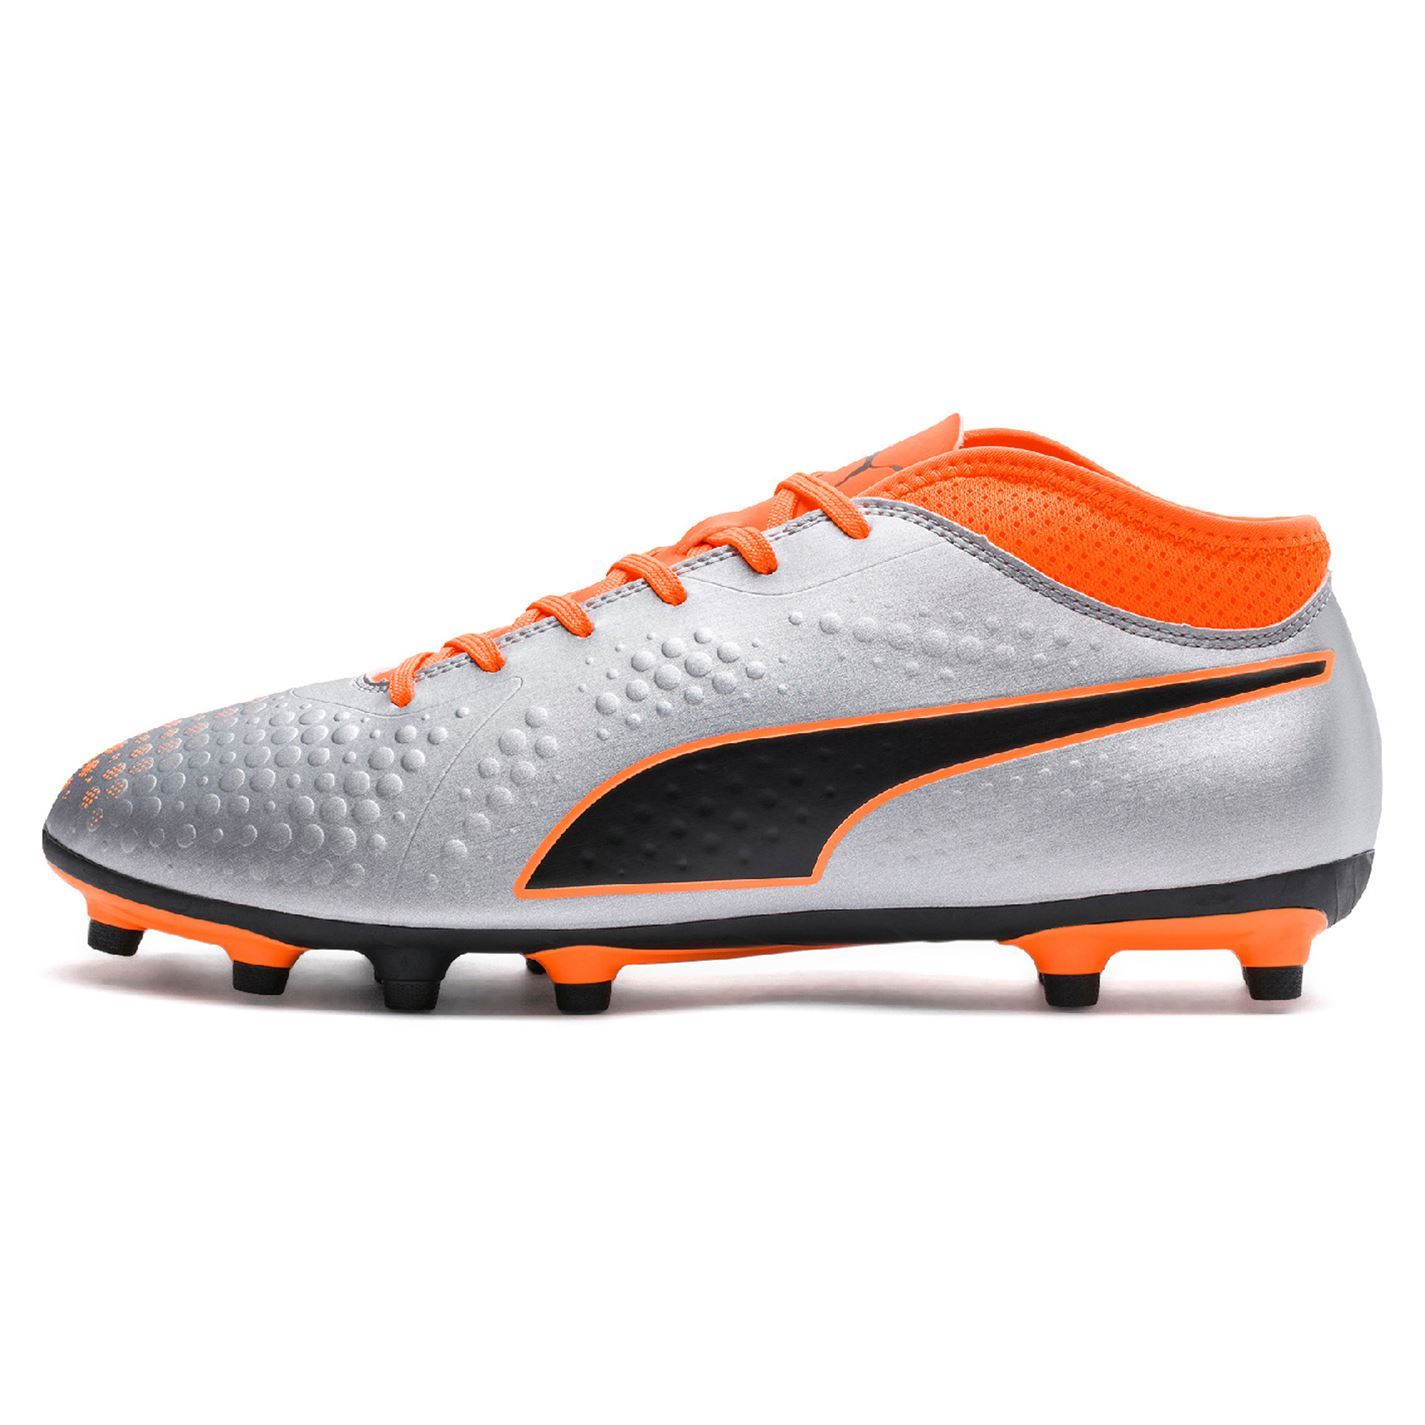 miniature 11 - Puma 4 FG Firm Ground Chaussures De Football Homme Football Chaussures Crampons